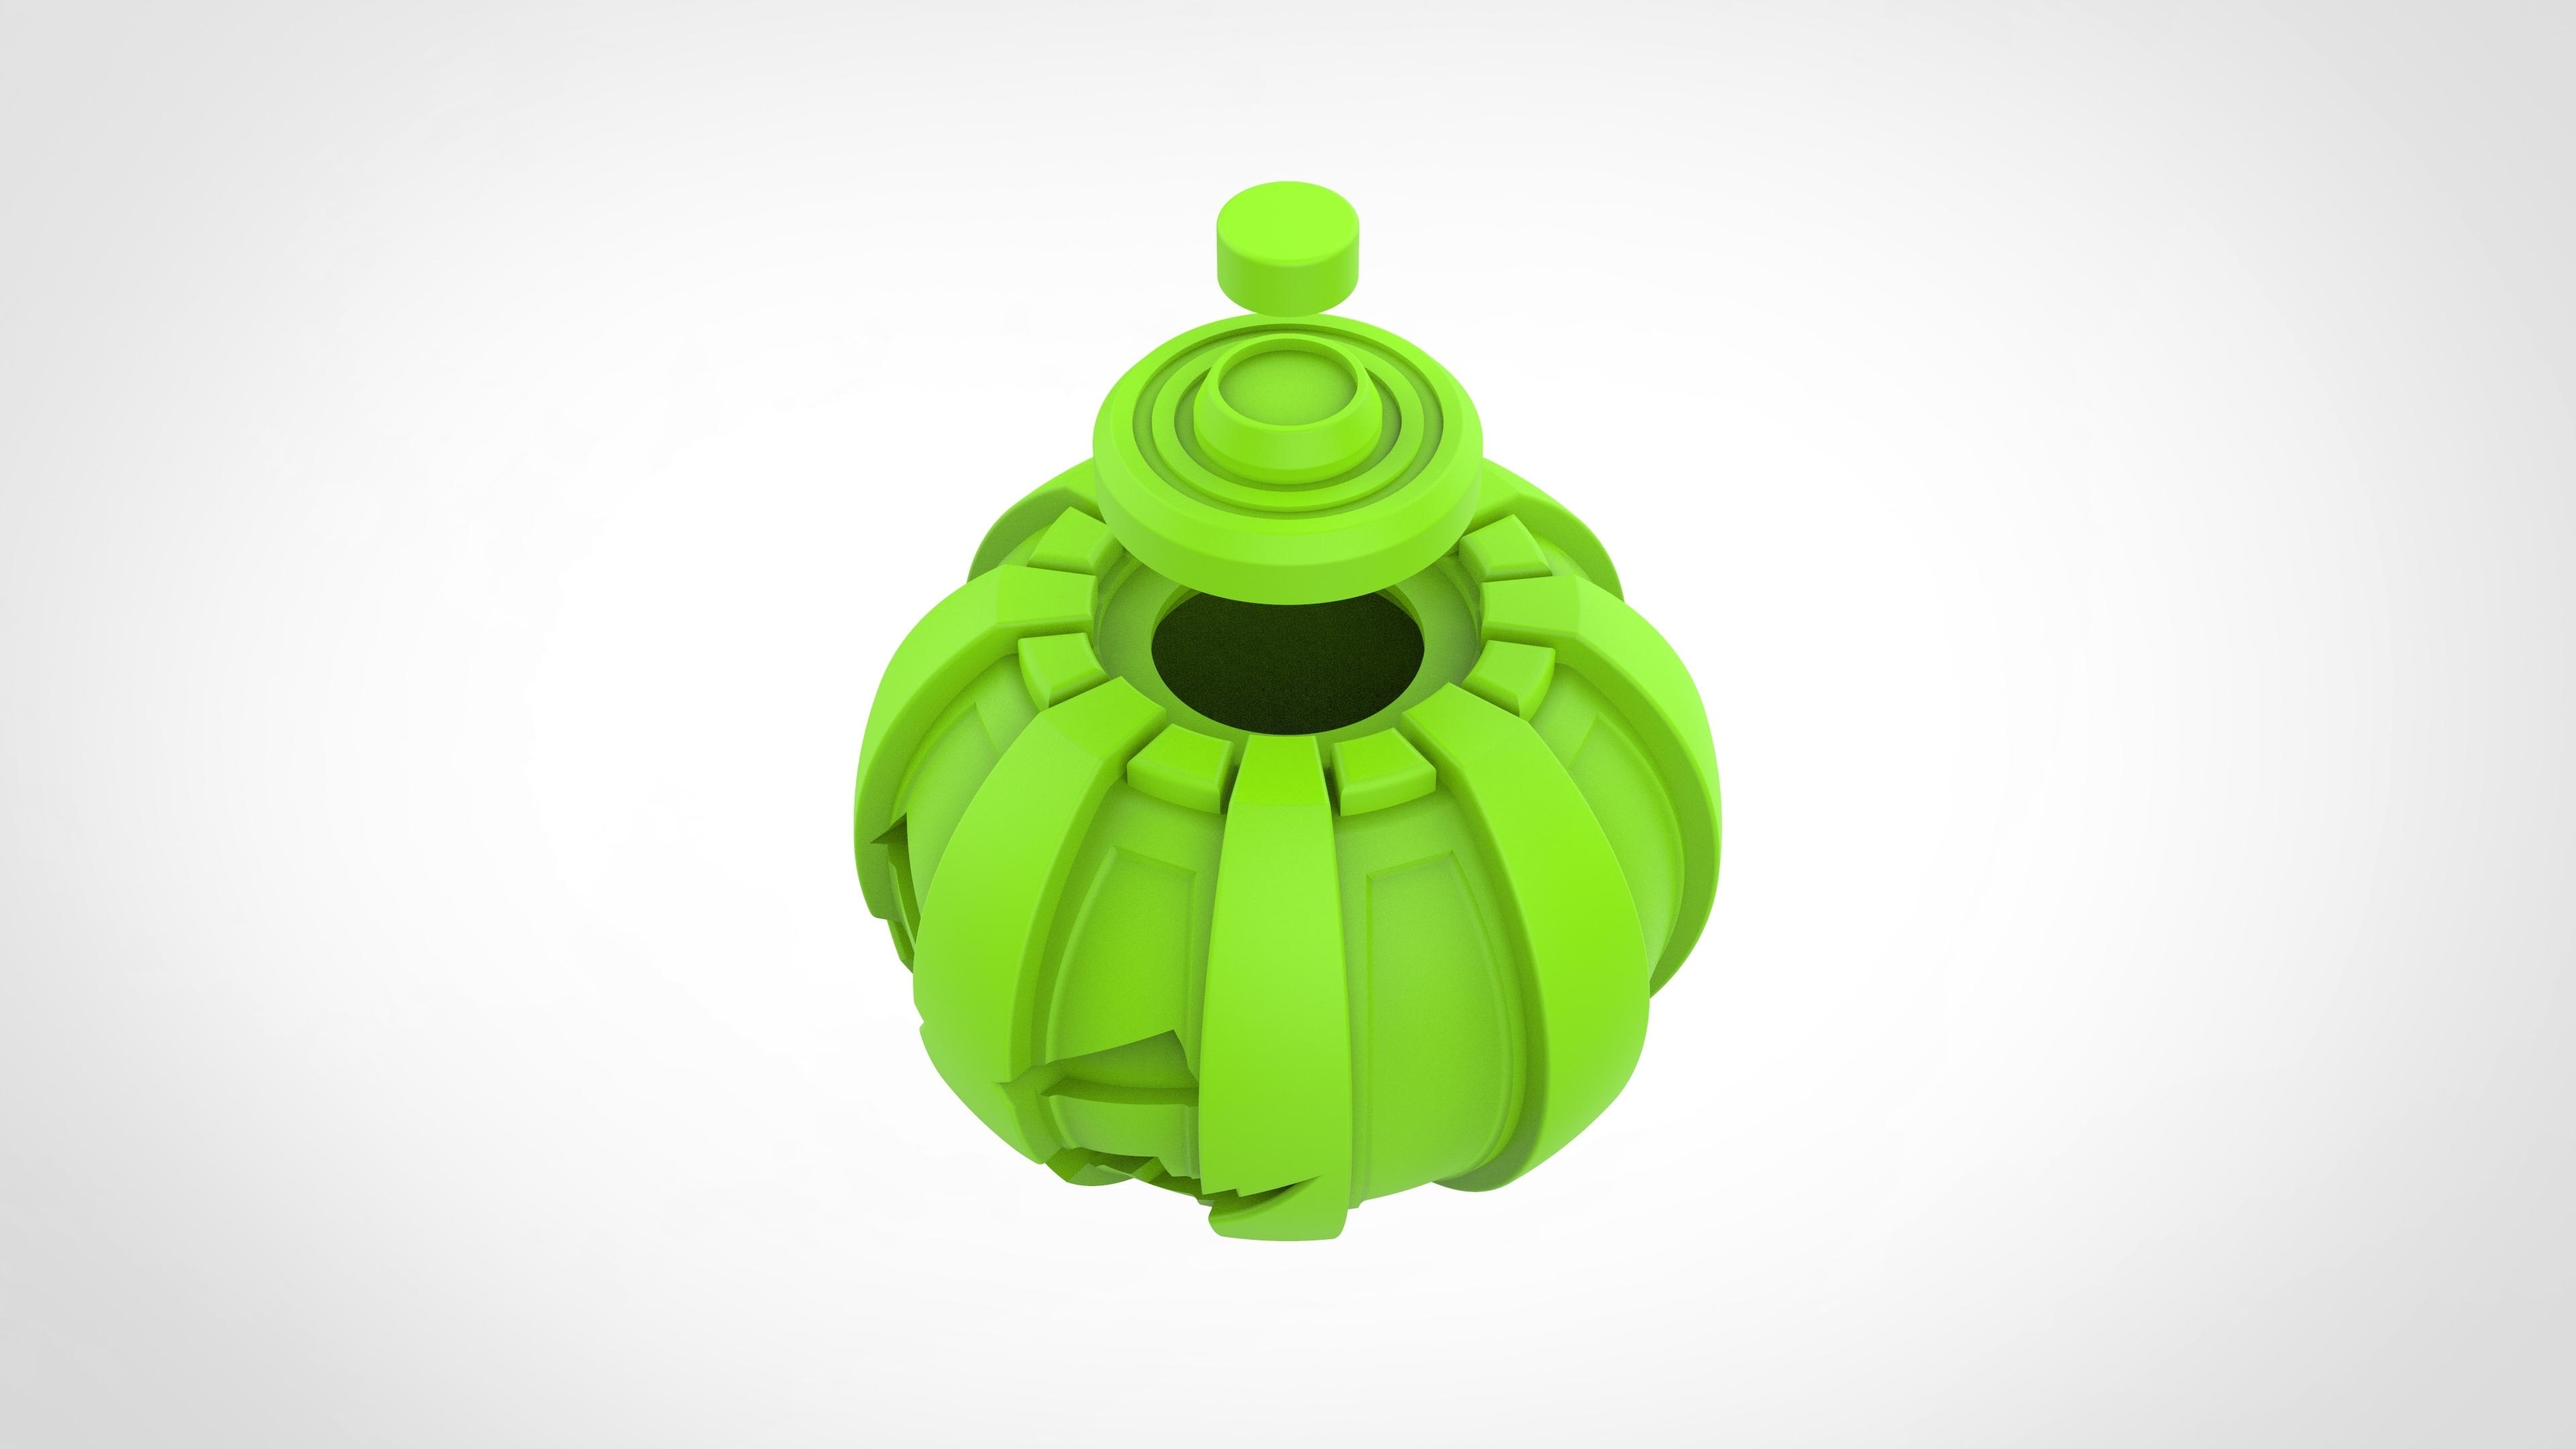 035.jpg Download 3MF file Green goblin bombs from the Spide-Man comics • 3D print model, vetrock